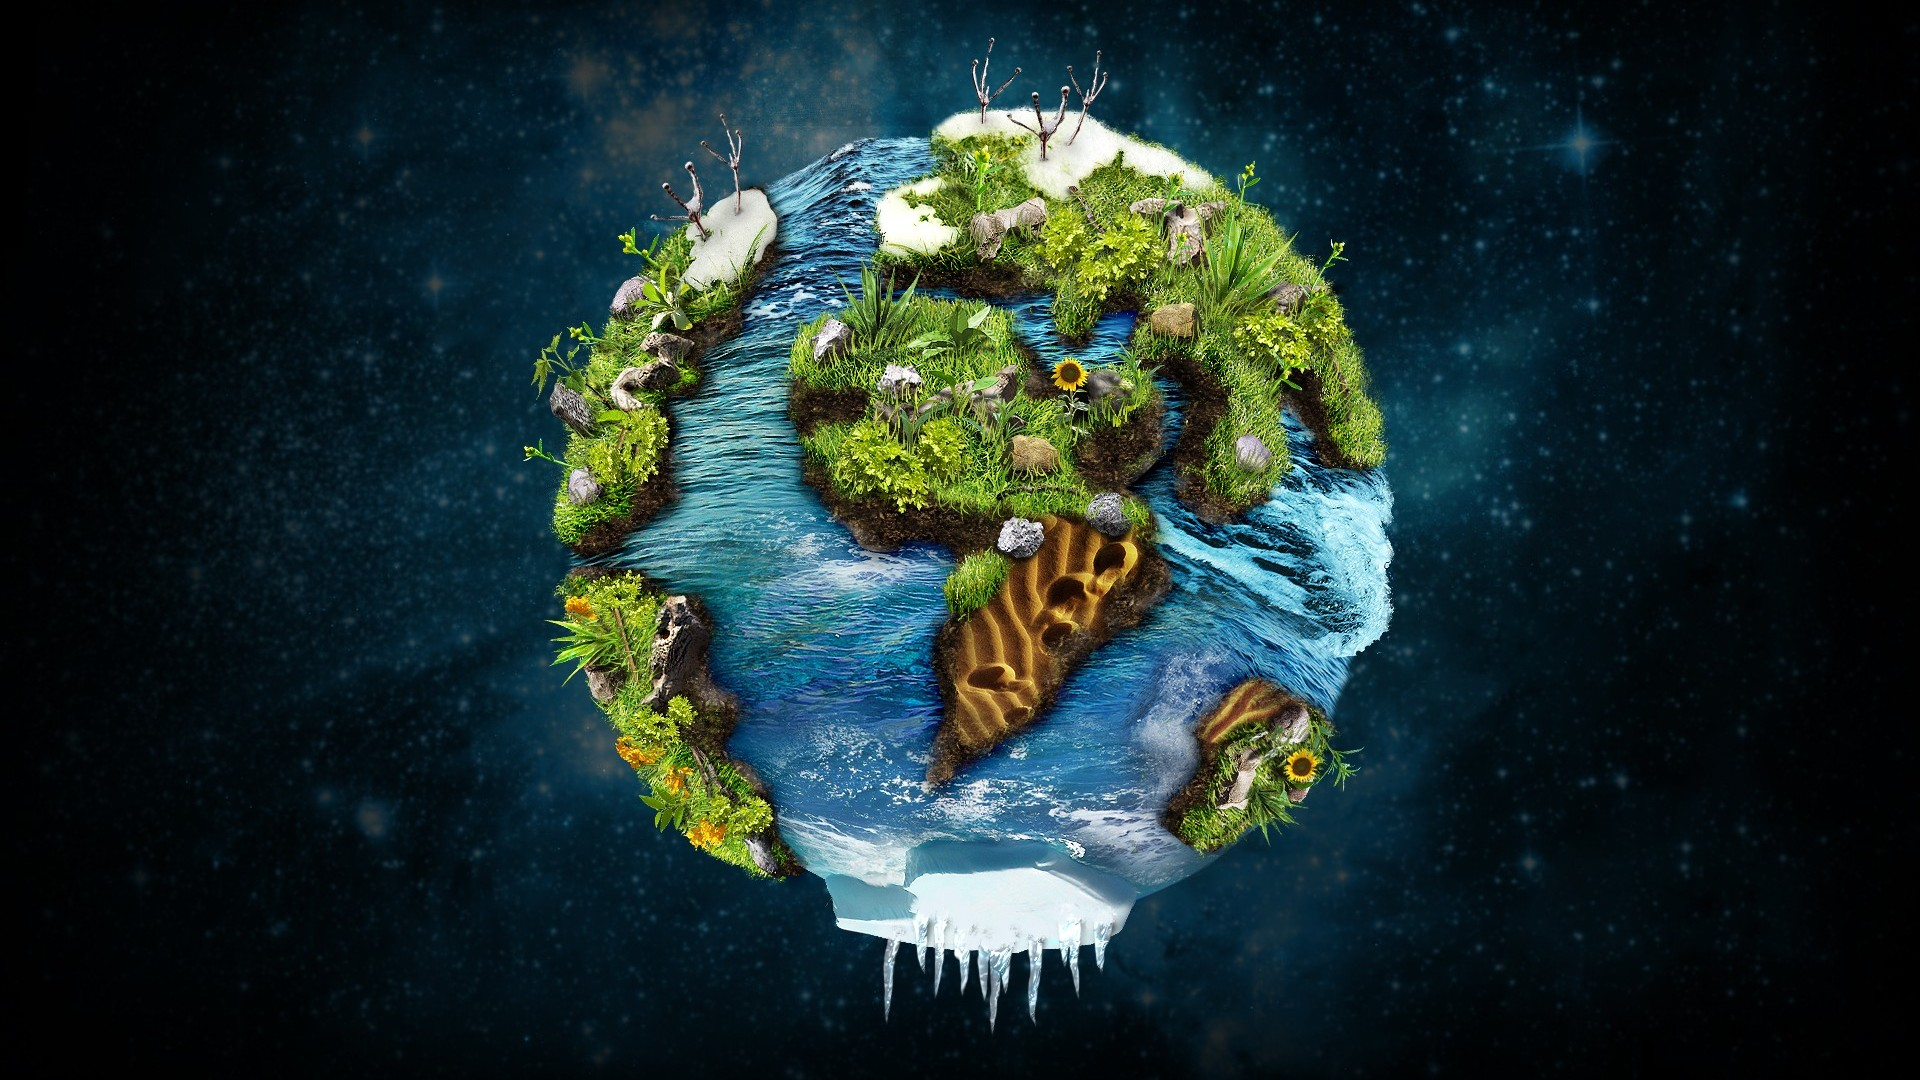 Planet Earth Wallpapers HD - WallpaperSafari